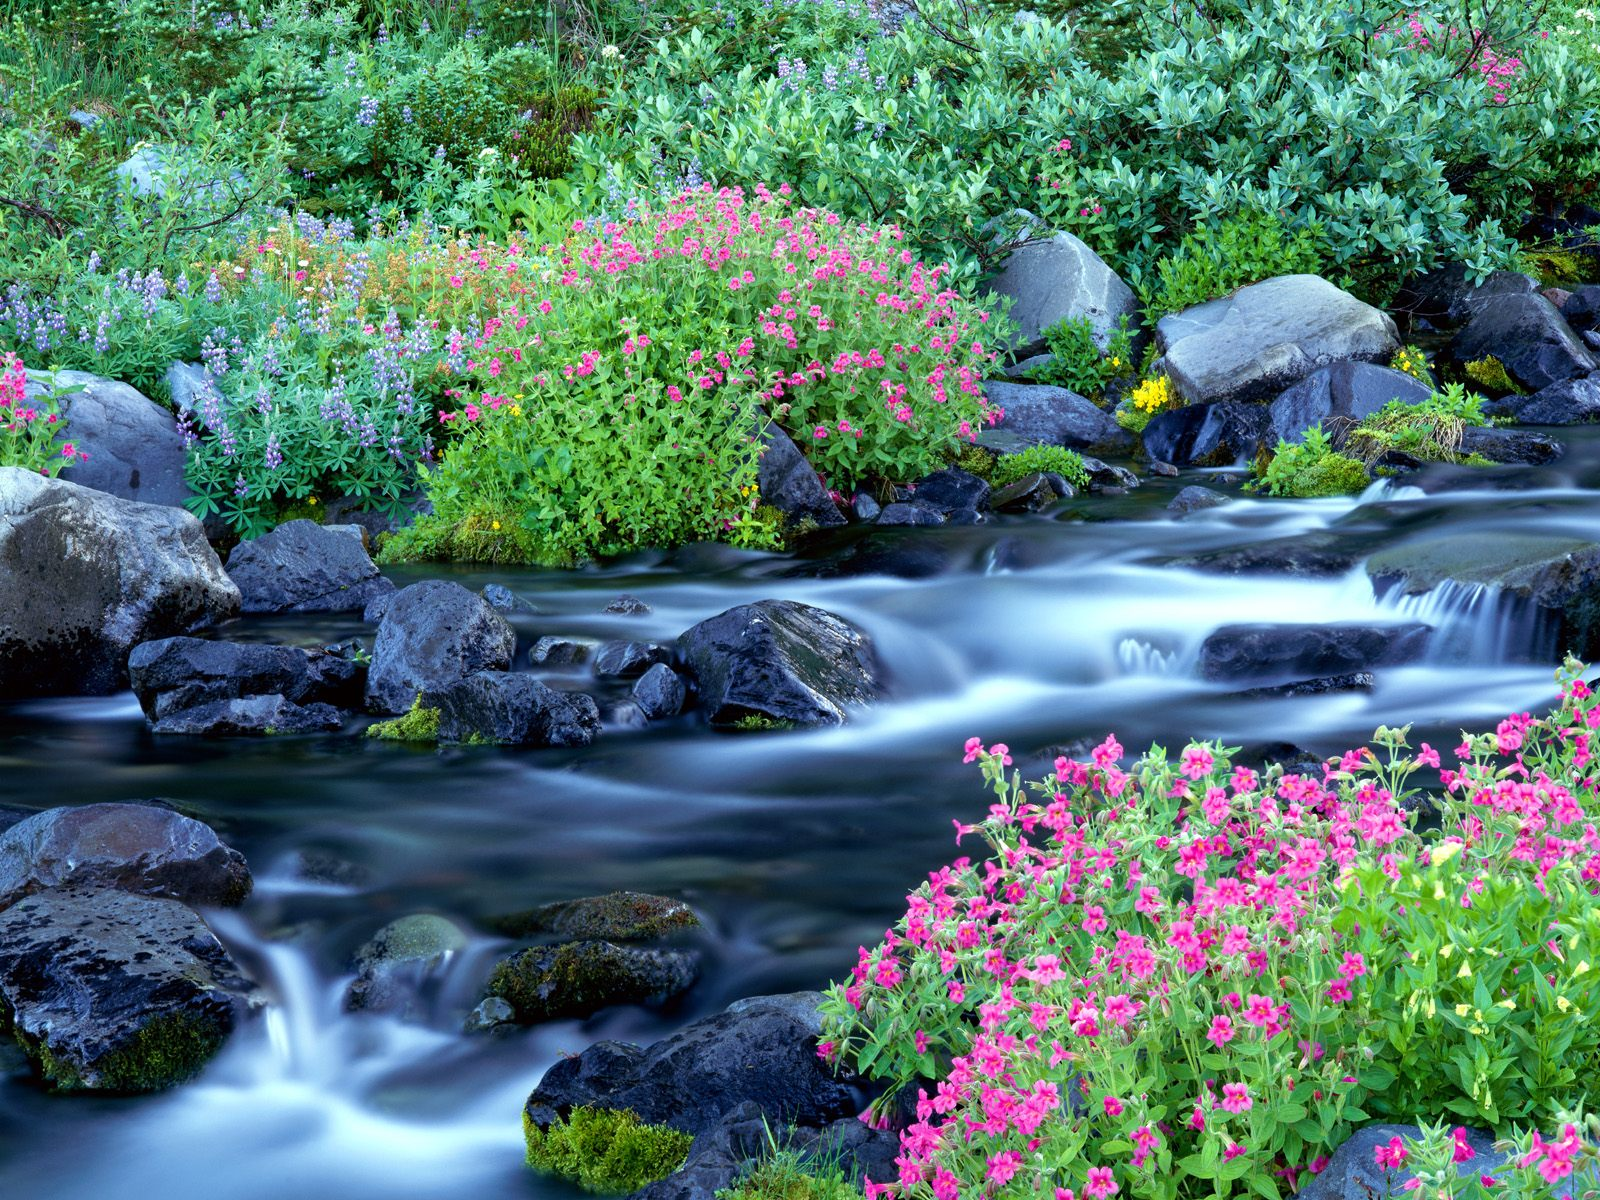 Wallpaper hd river flows in you noten - c